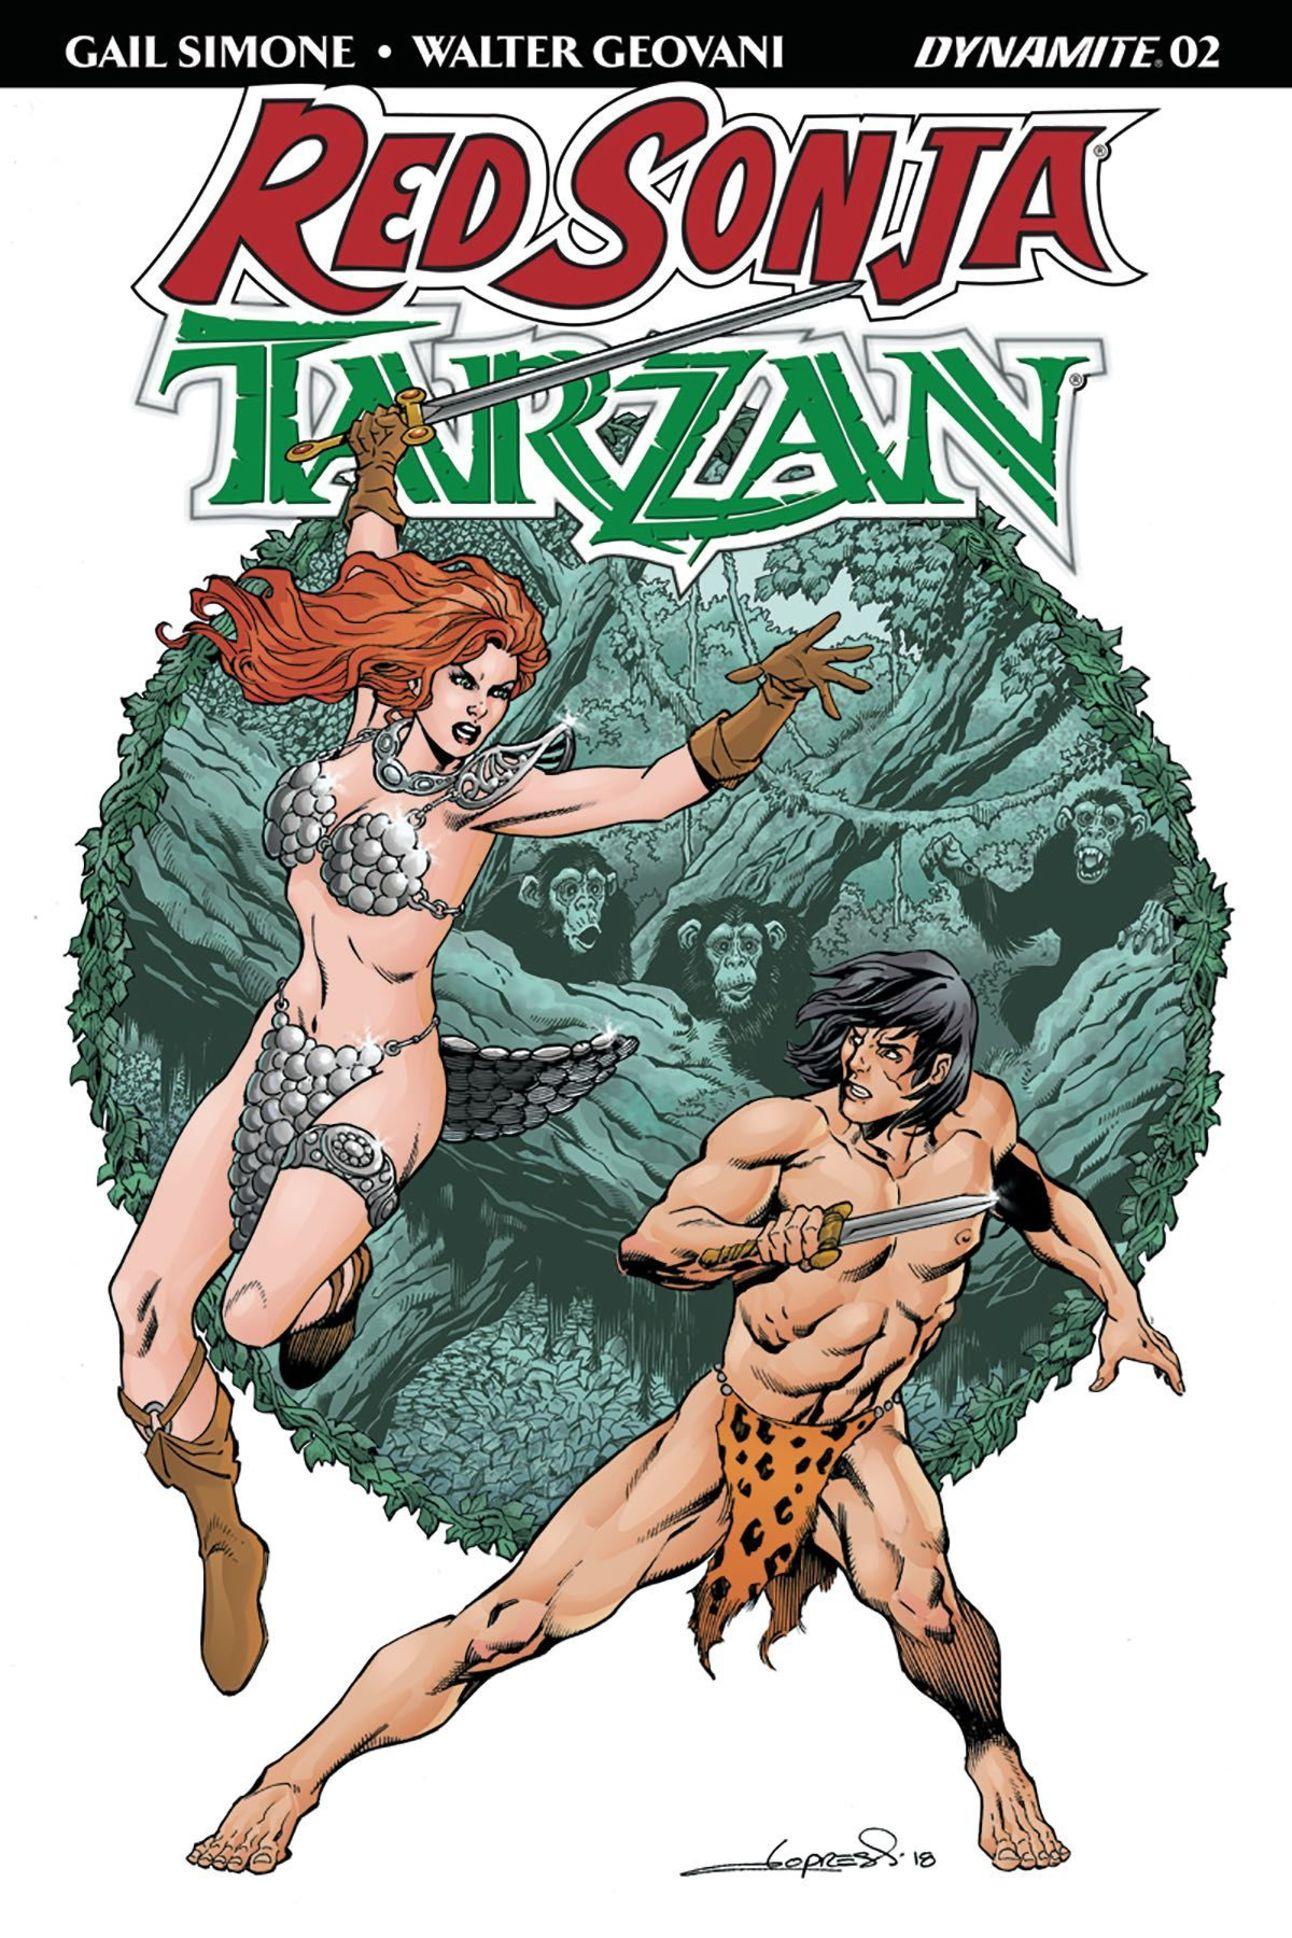 Red Sonja Tarzan 2 cover by Aaron Lopresti